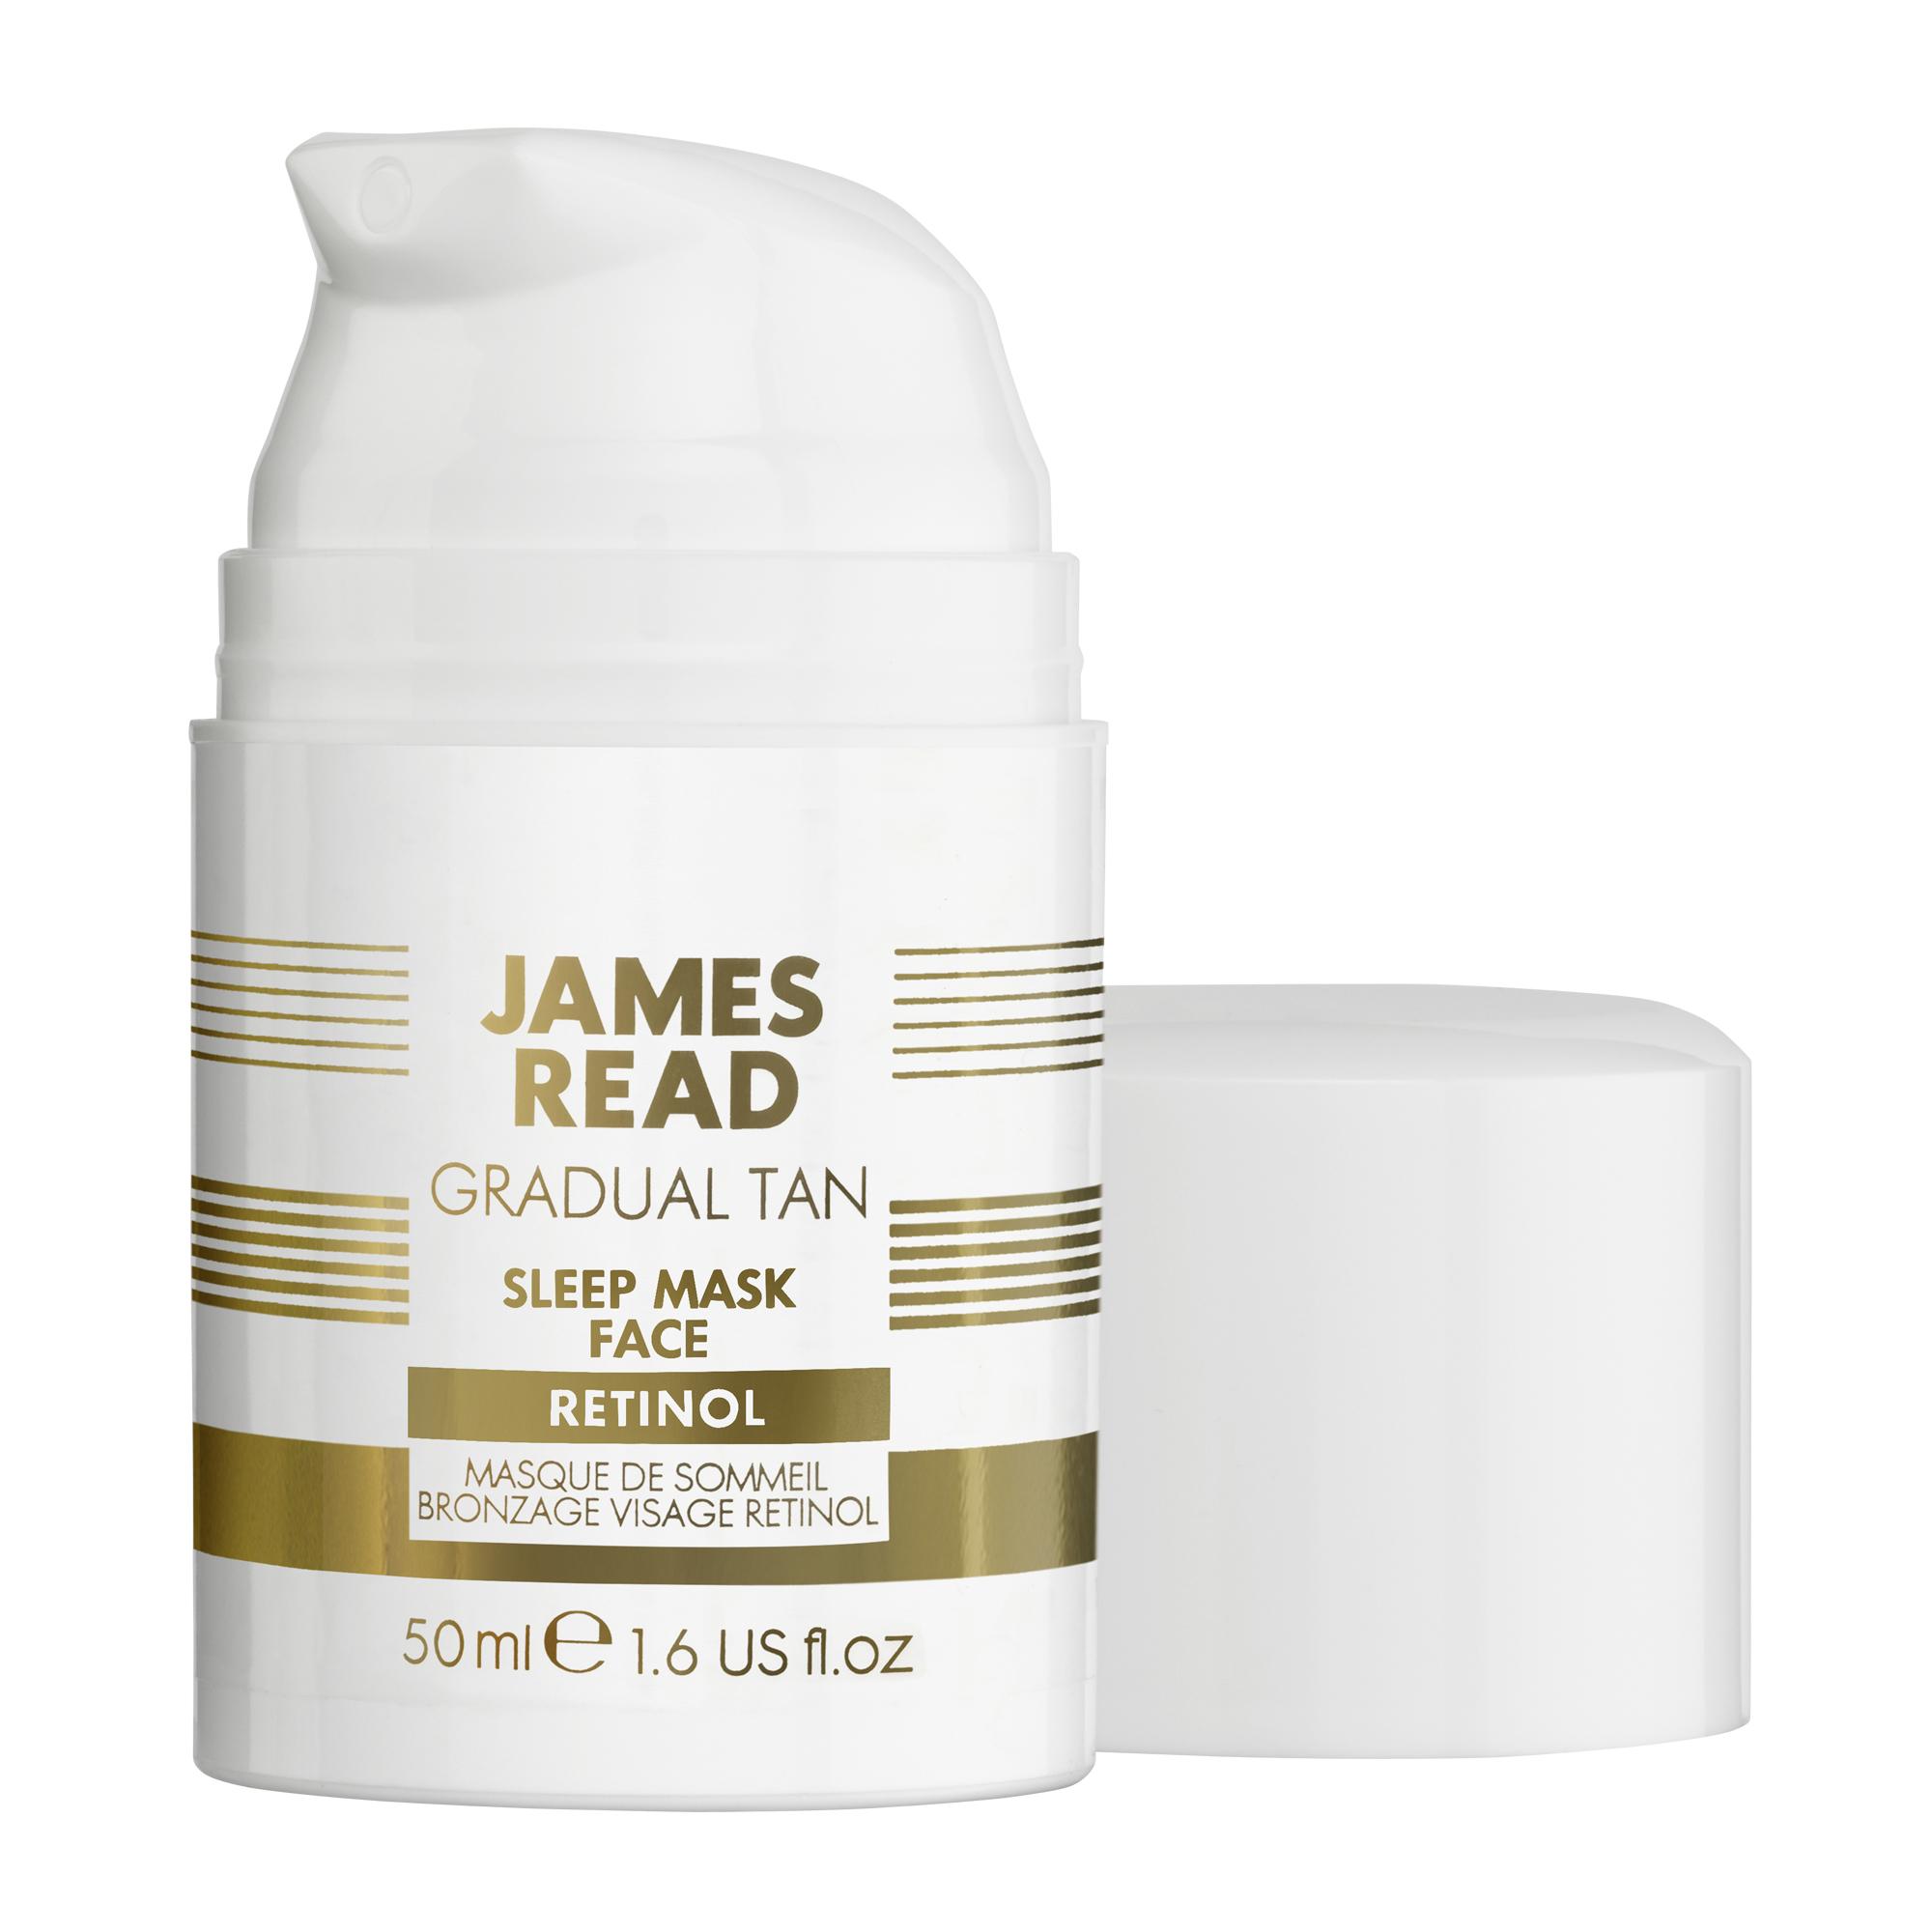 JAMES READ Gradual Sleep Mask Tan Retinol